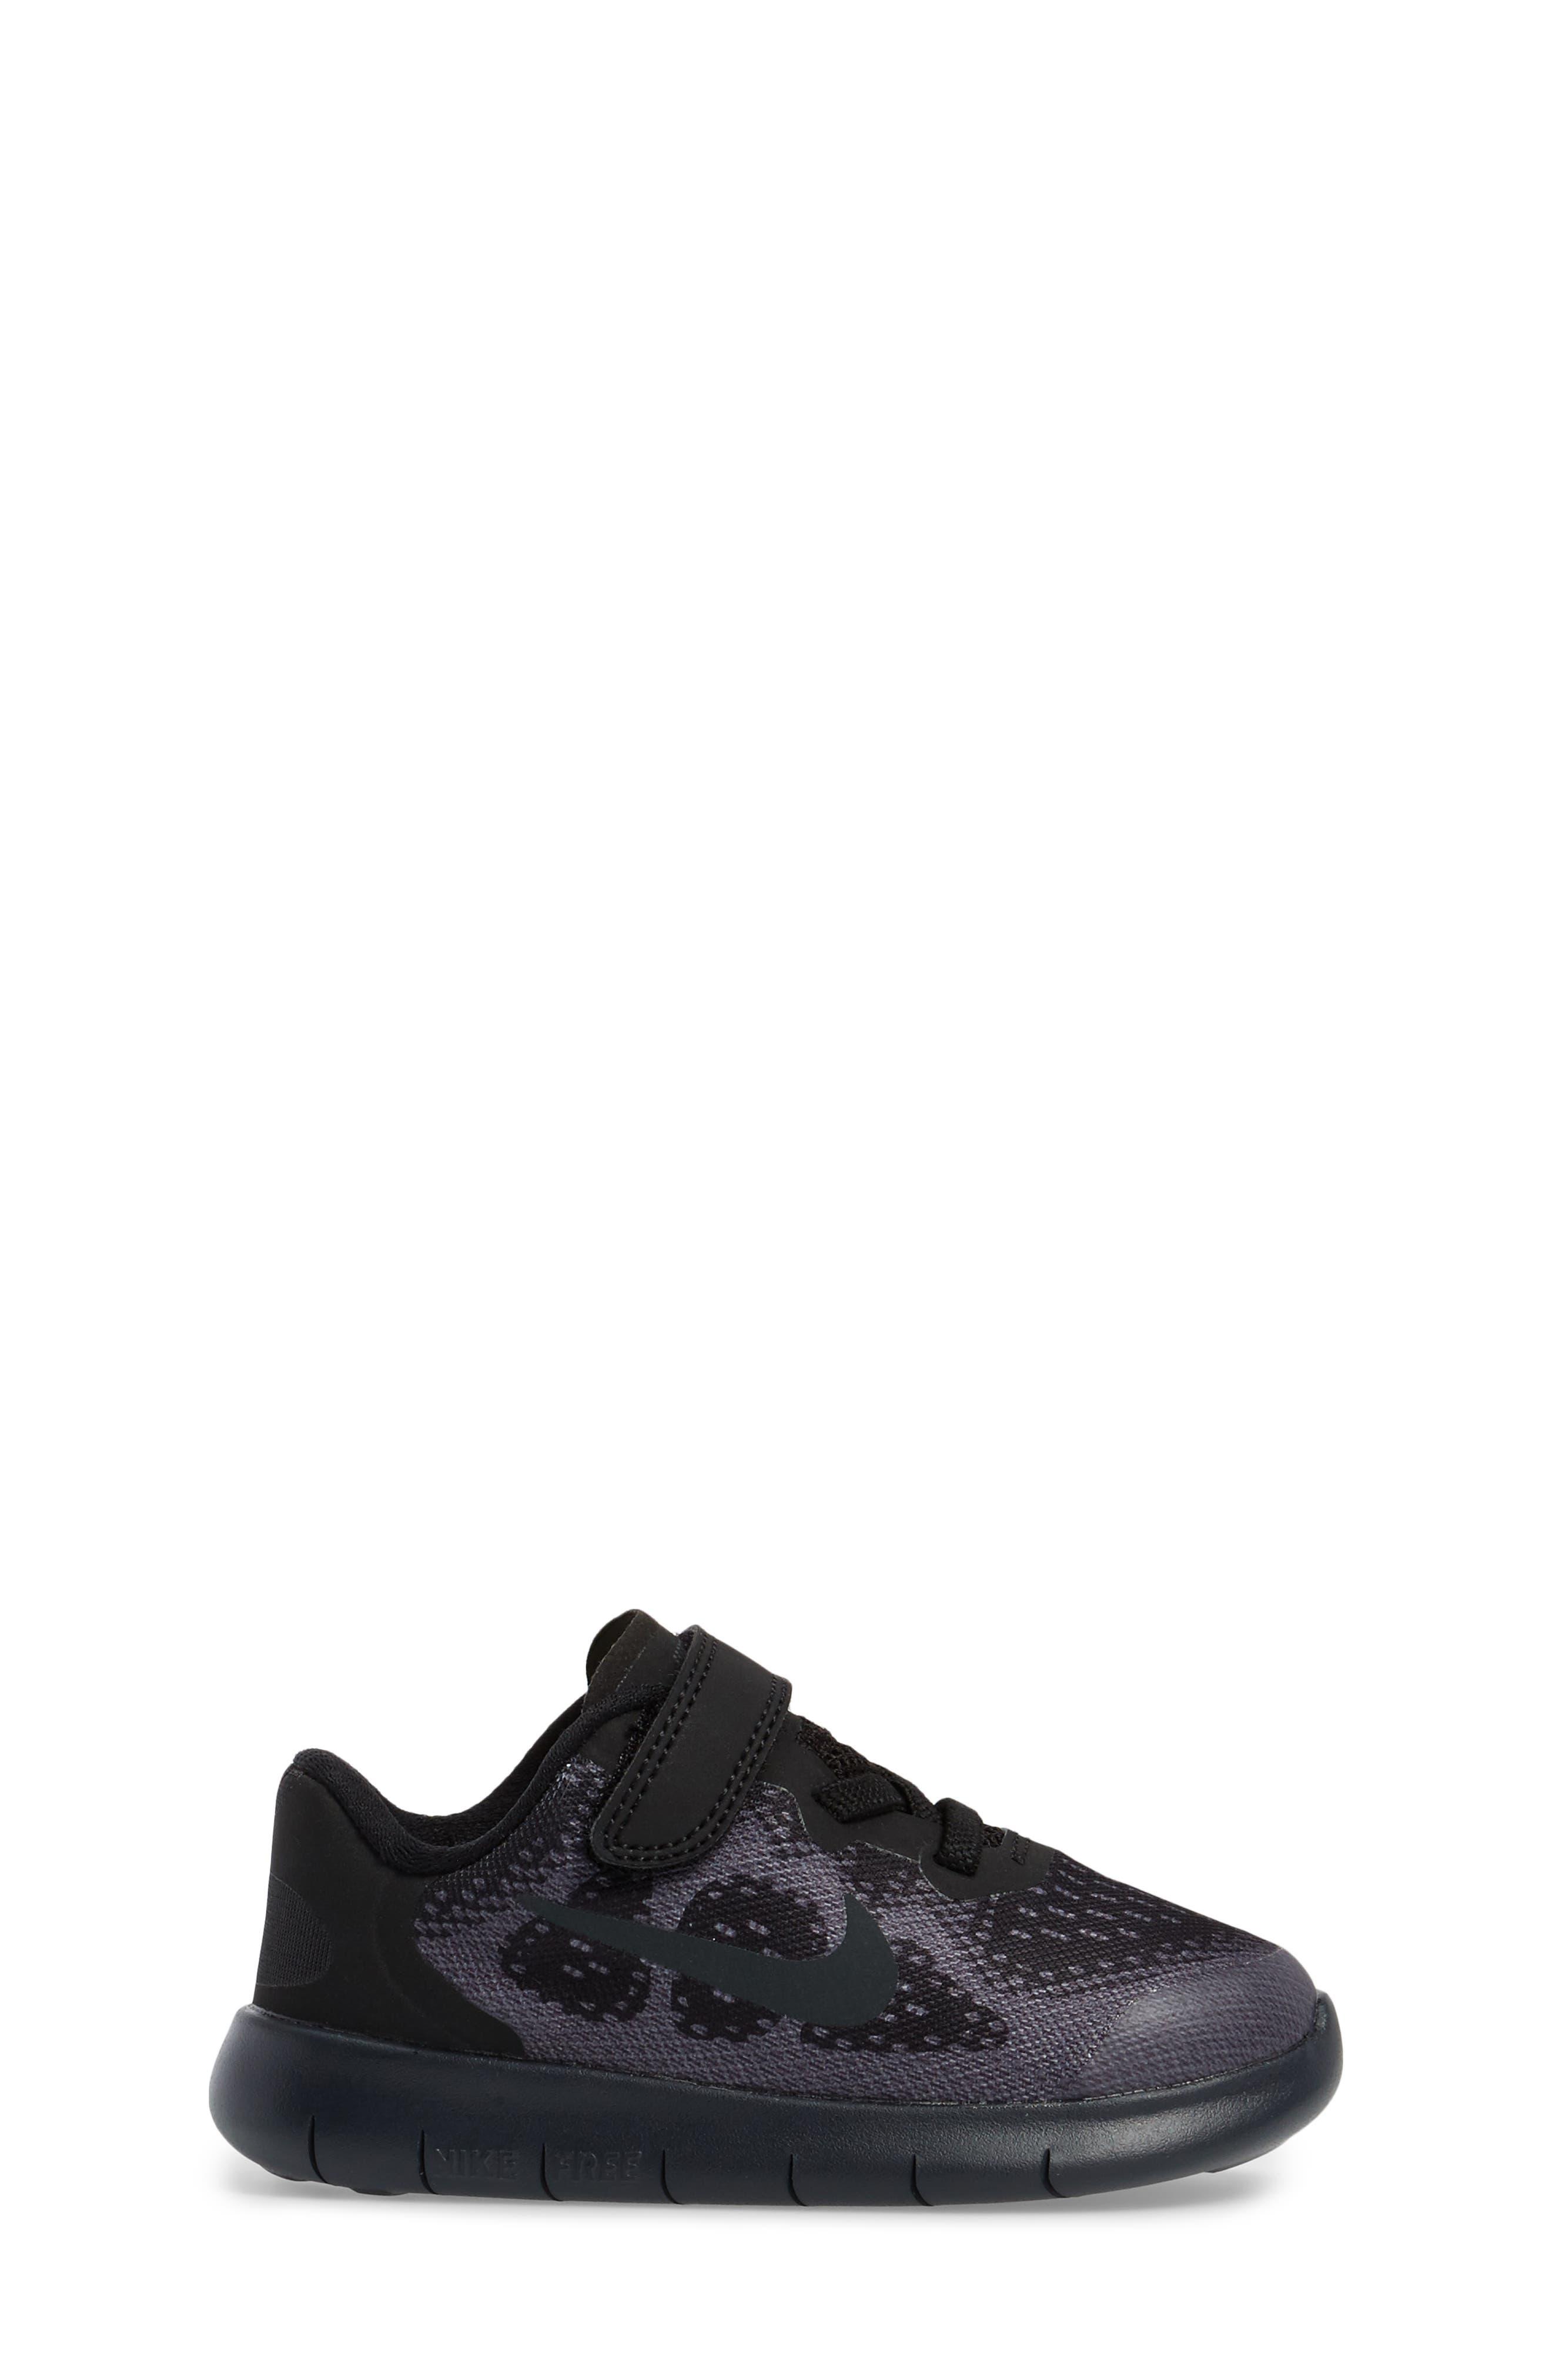 Free RN 2017 Sneaker,                             Alternate thumbnail 3, color,                             001